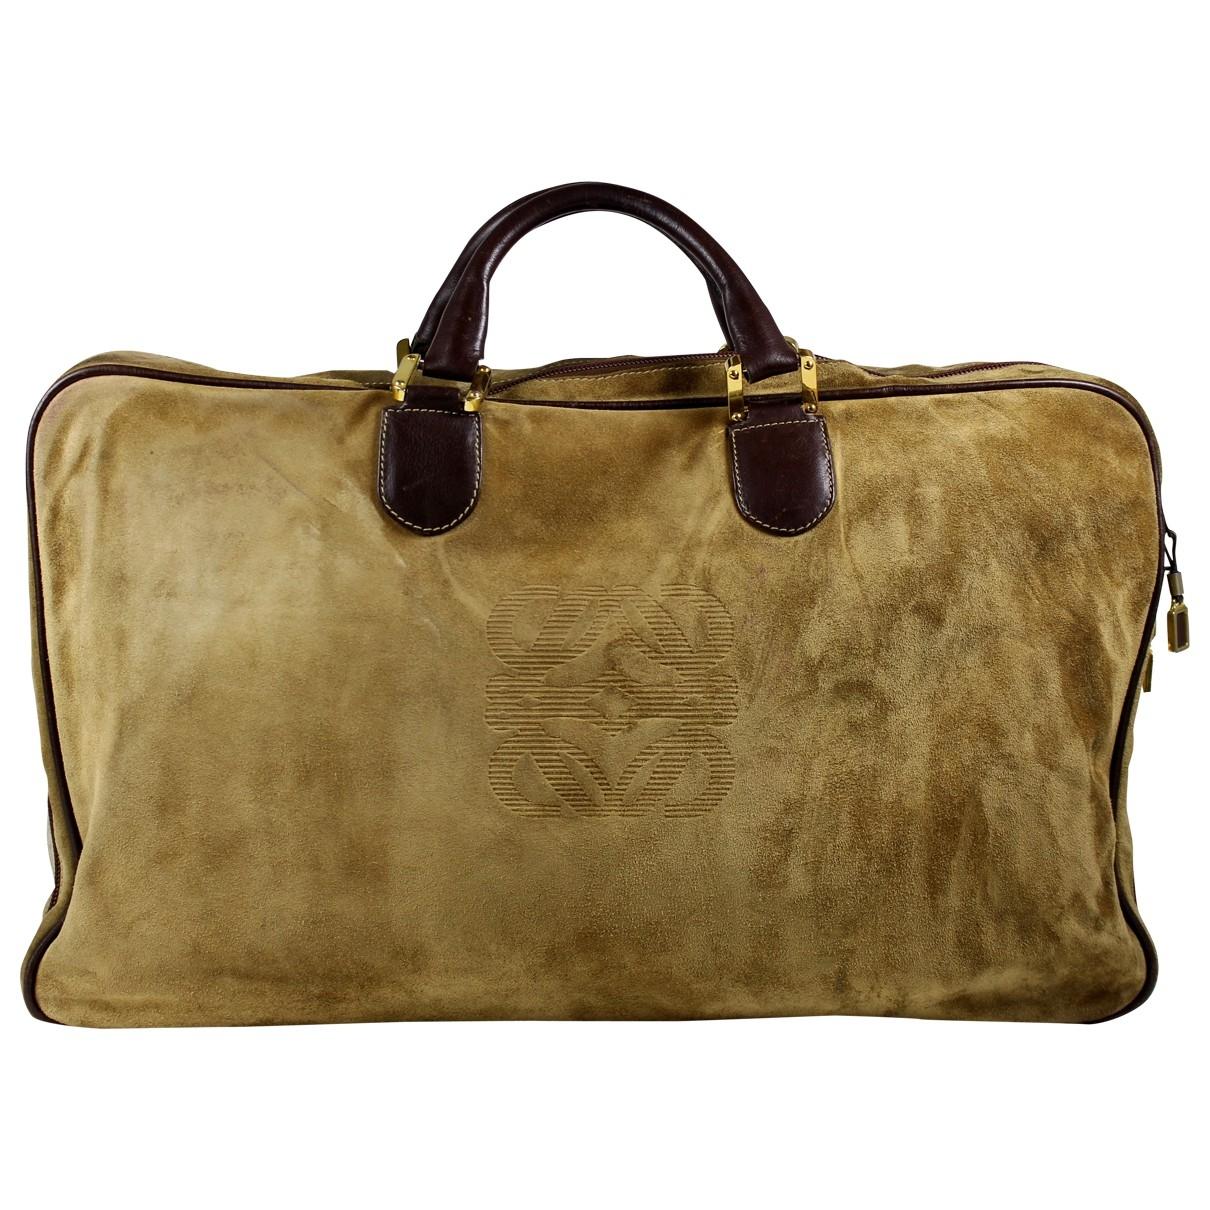 Loewe Amazona Beige Suede Travel bag for Women \N